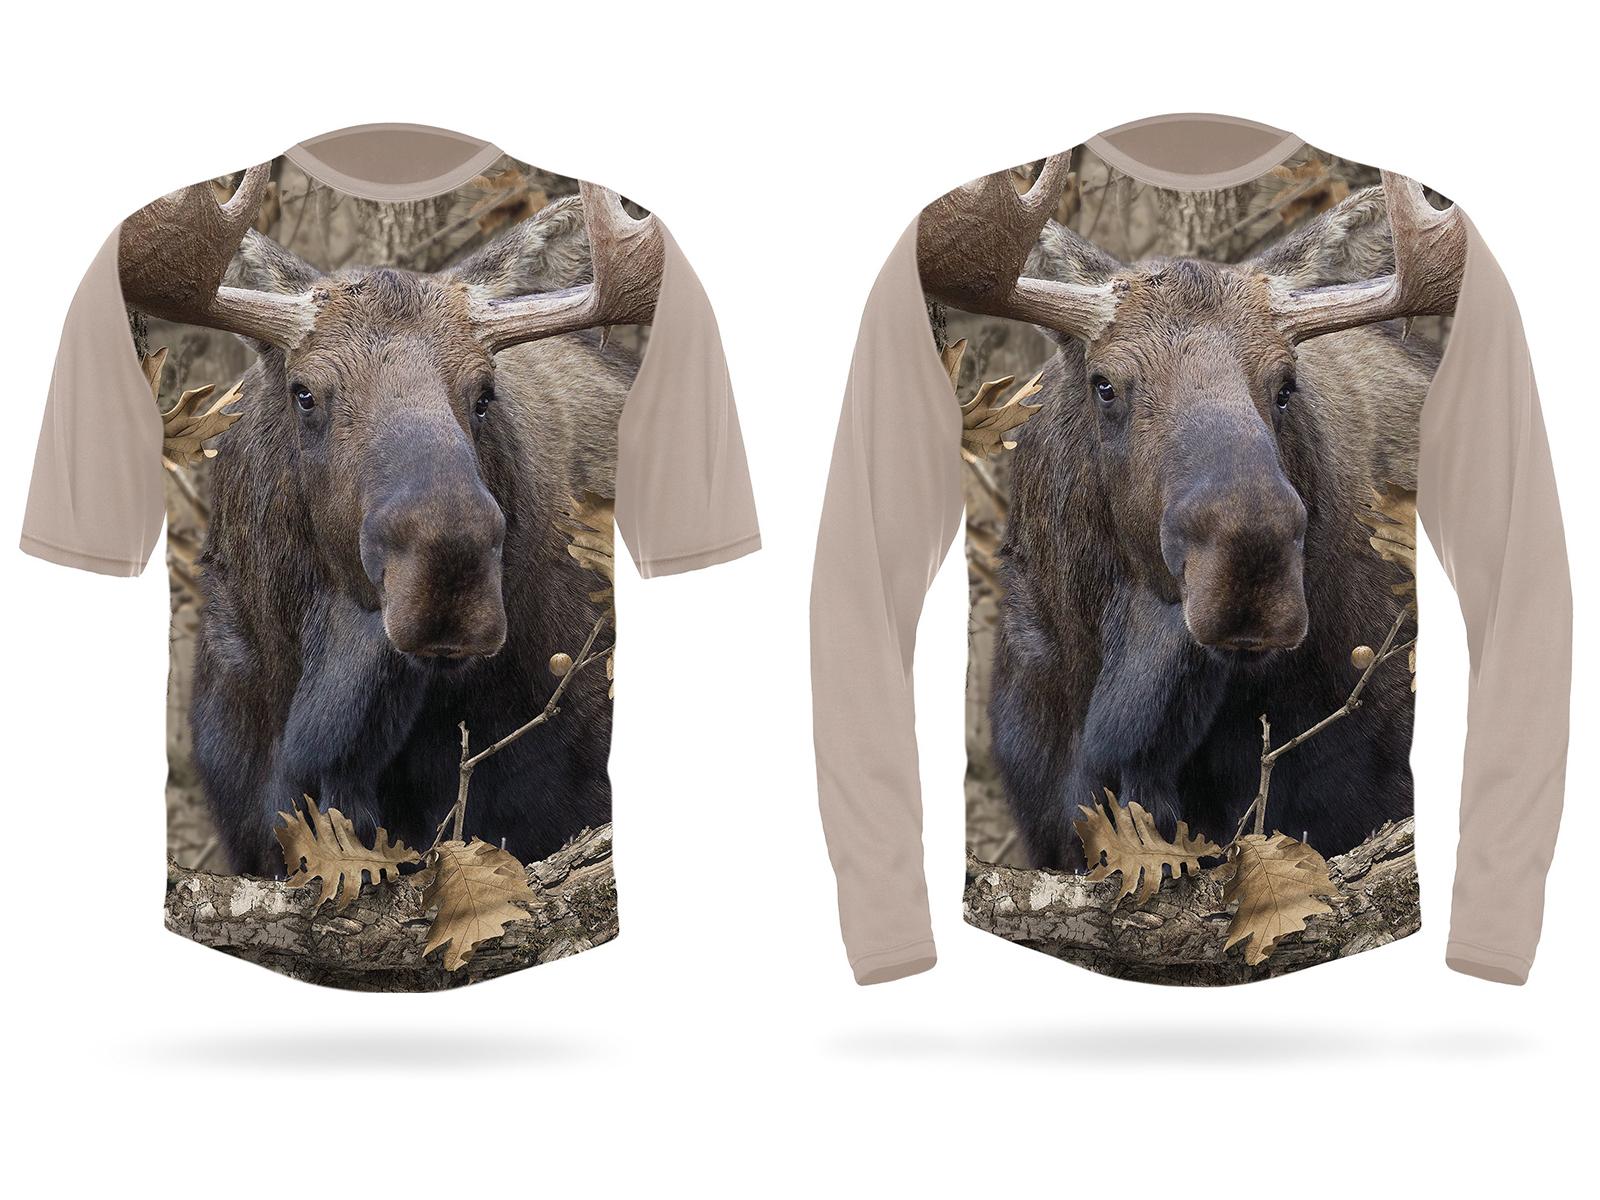 Journey to Moose Hunting in Alaska